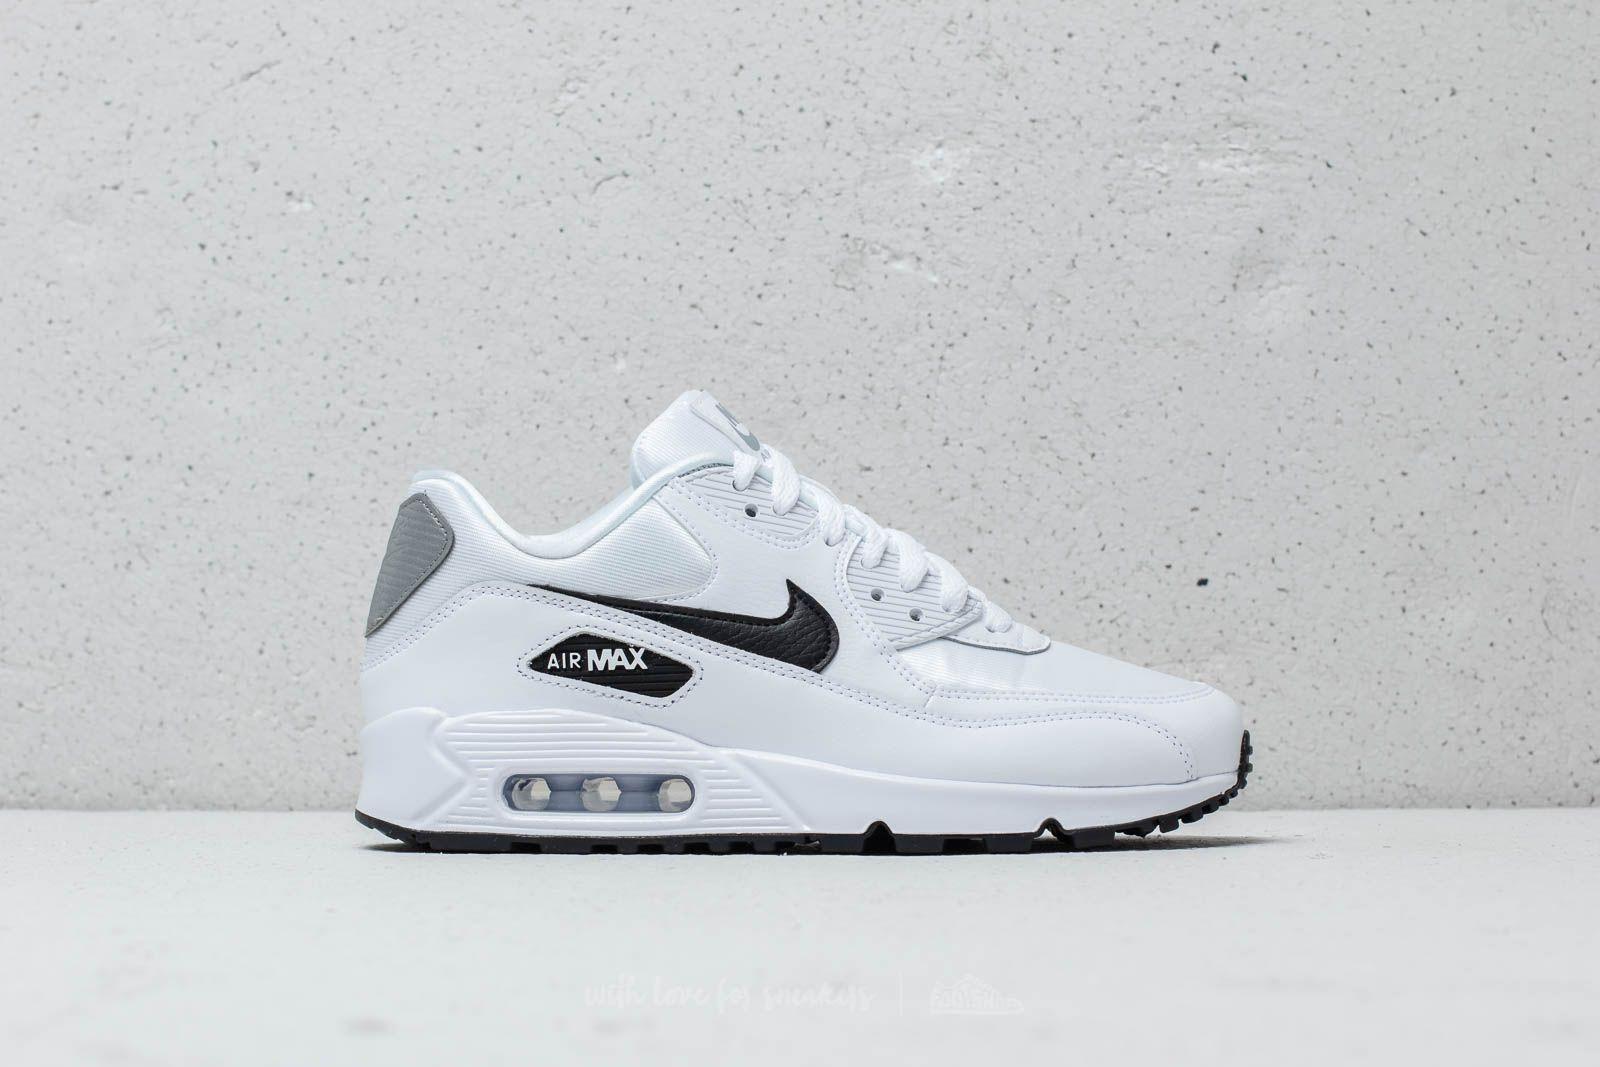 Nike Wmns Air Max 90 White Black Reflect Silver | Footshop